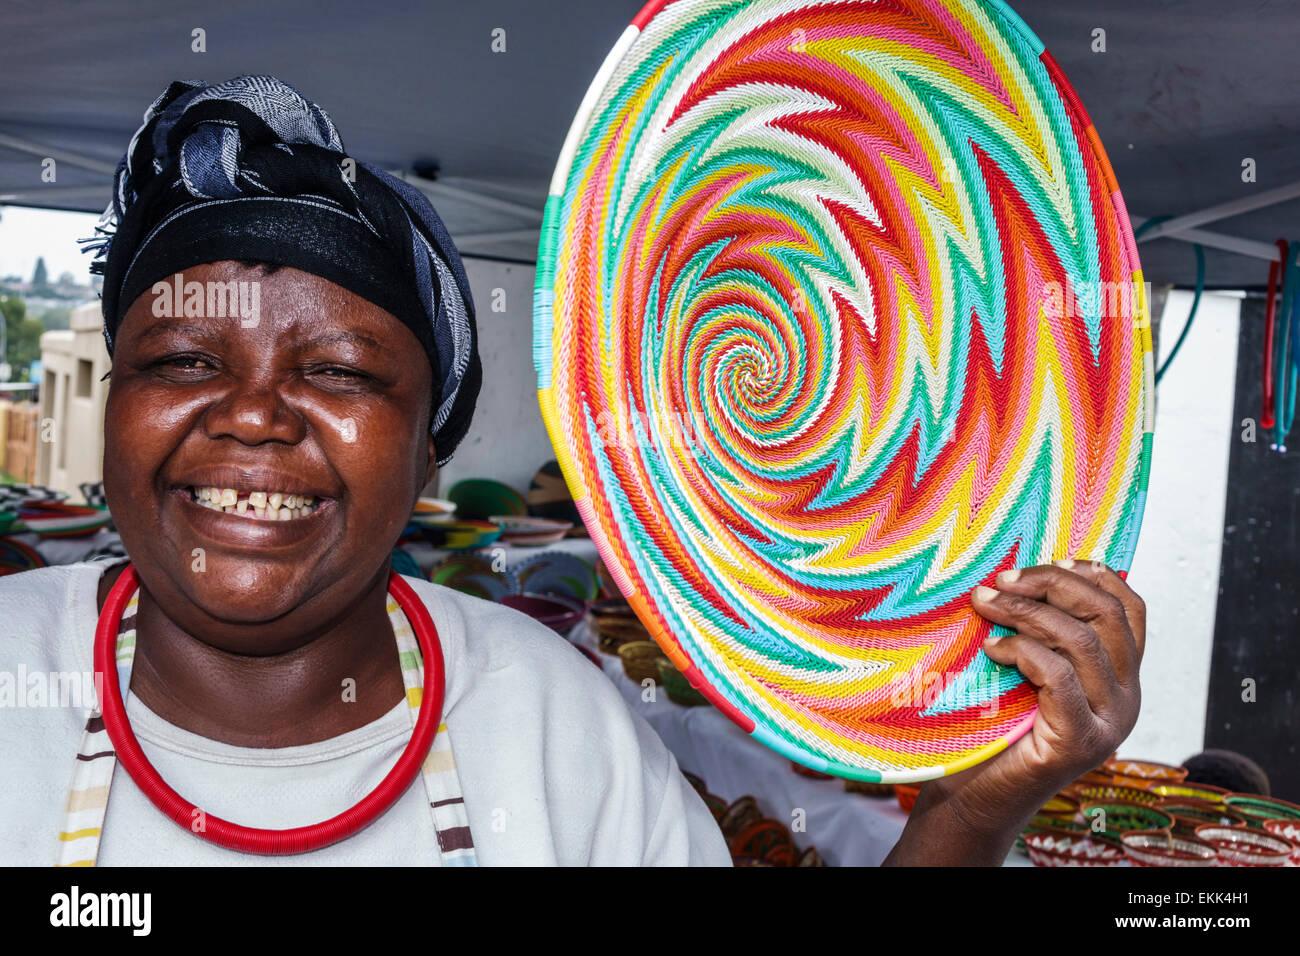 Johannesburg South Africa African Soweto Vilakazi Street Precinct Zulu telephone wire basket vendor Black woman - Stock Photo